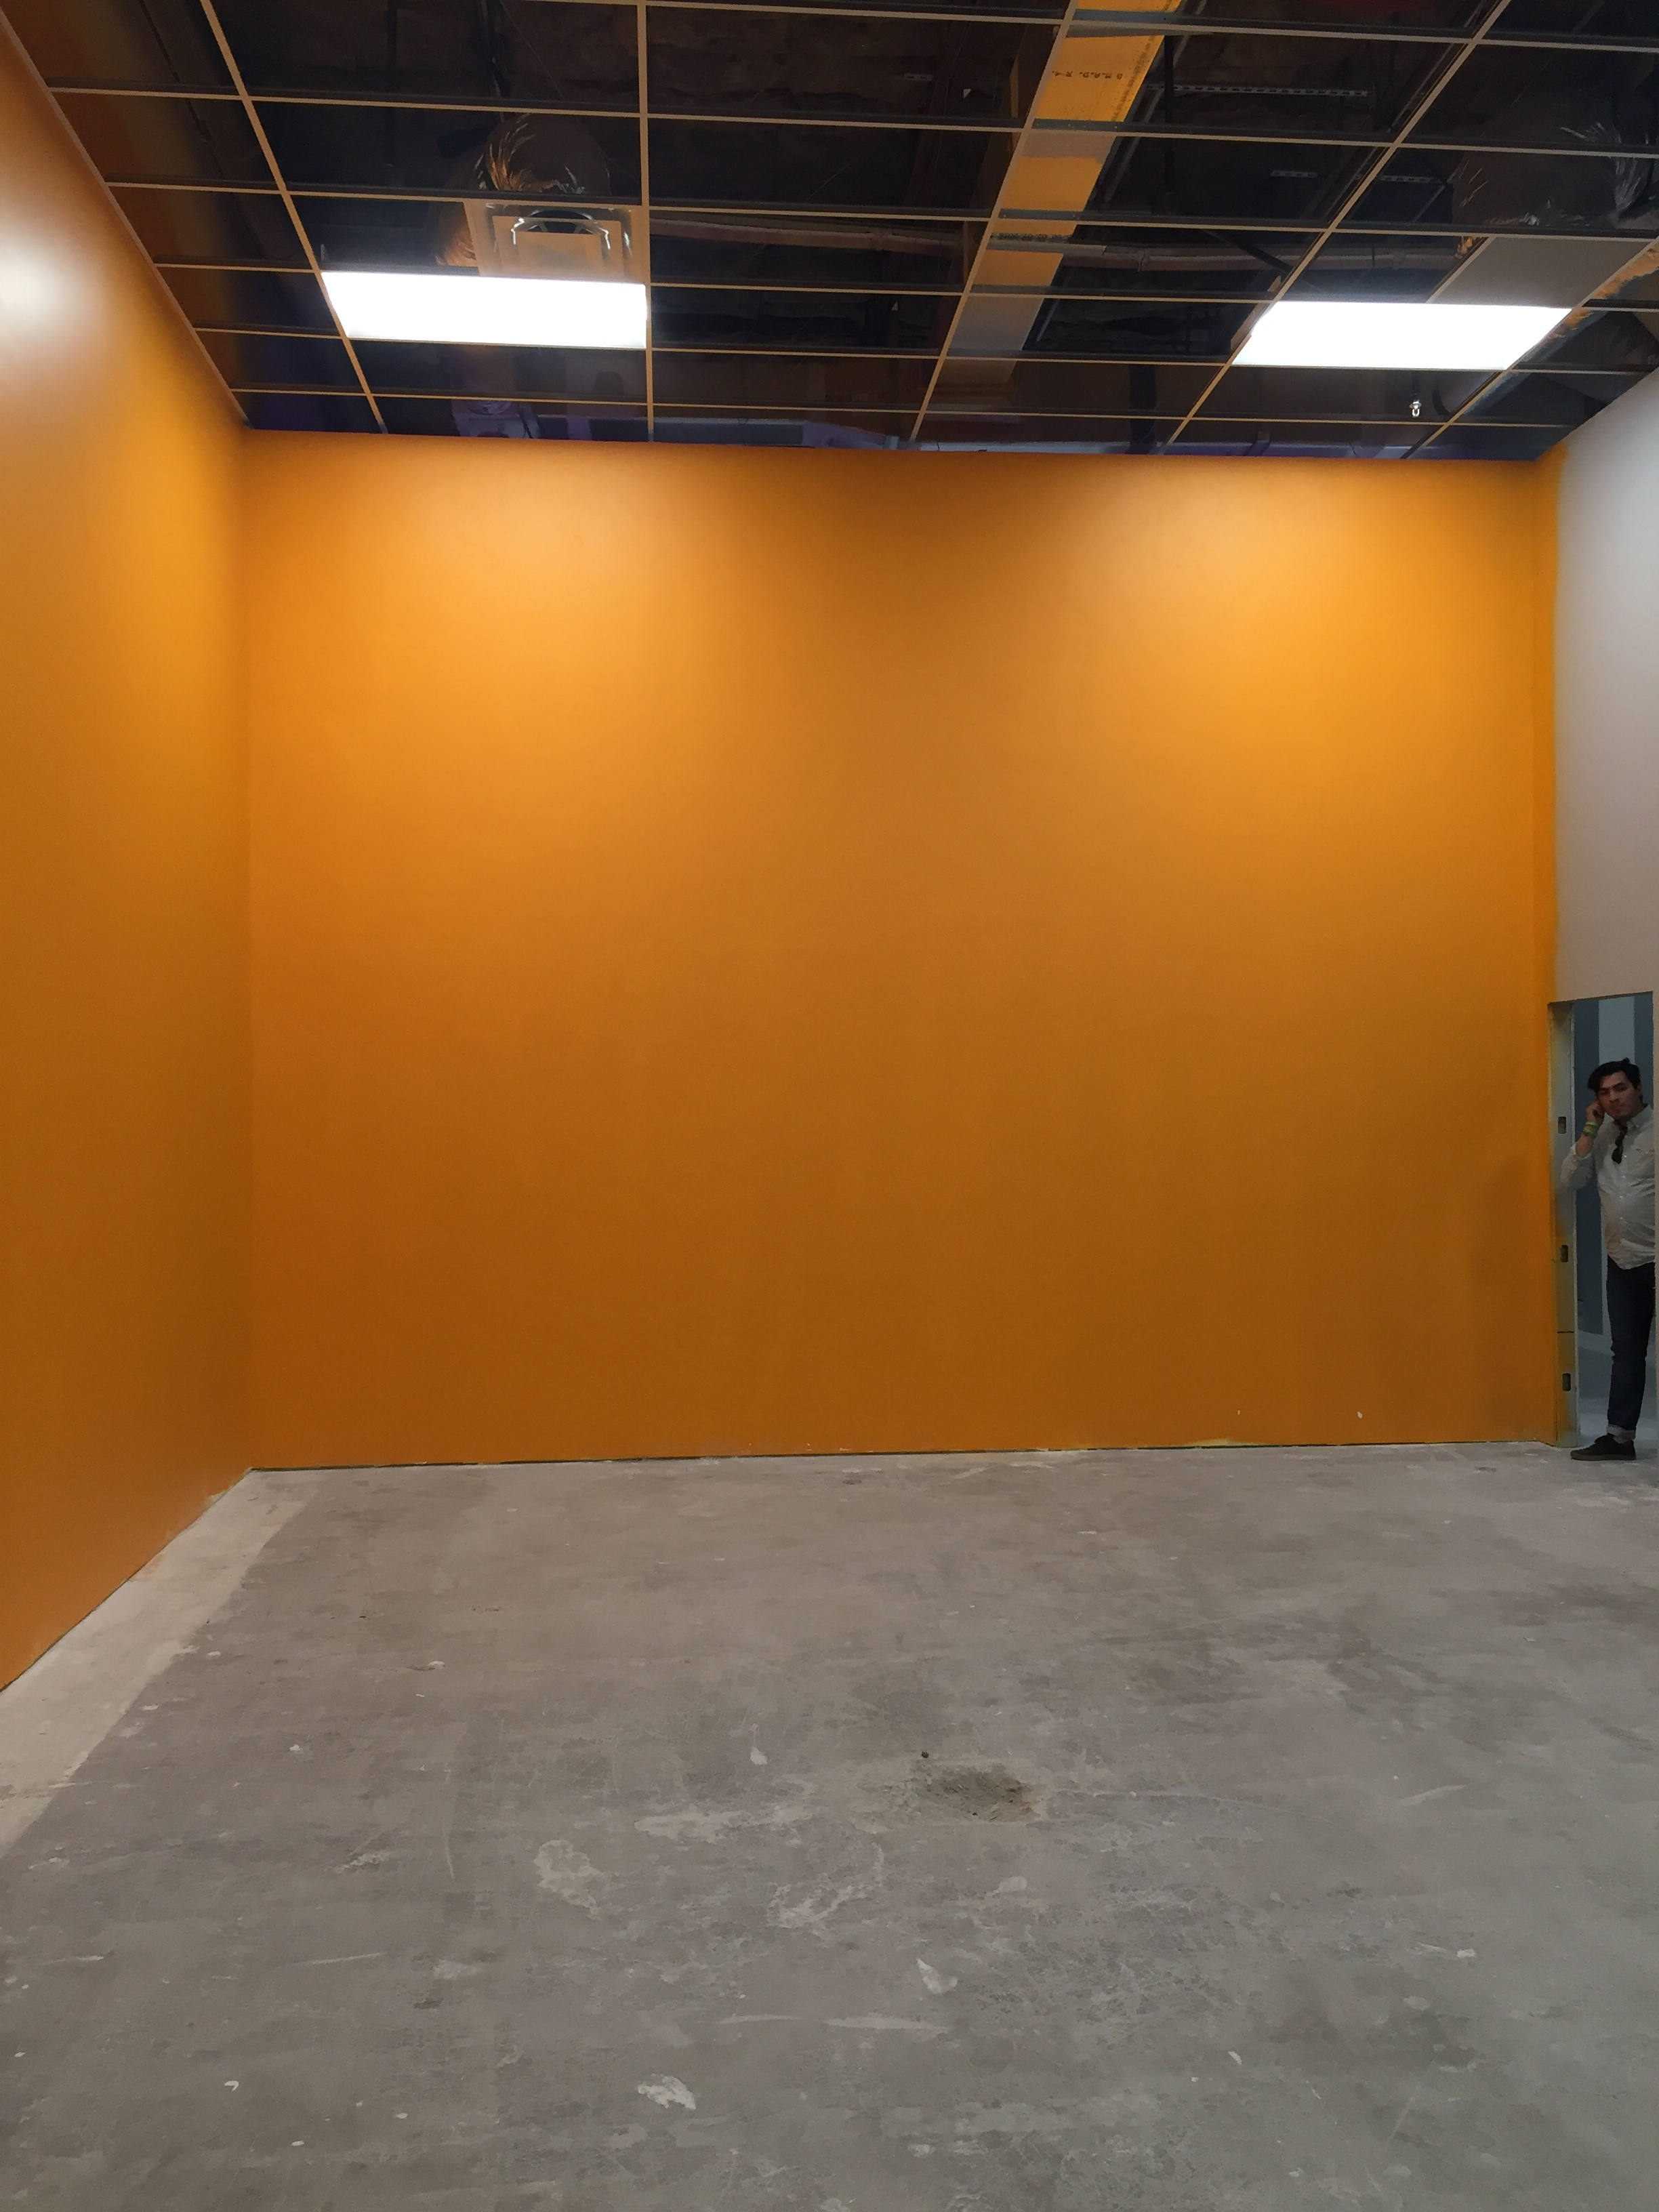 Children's Ministry | Orange Room